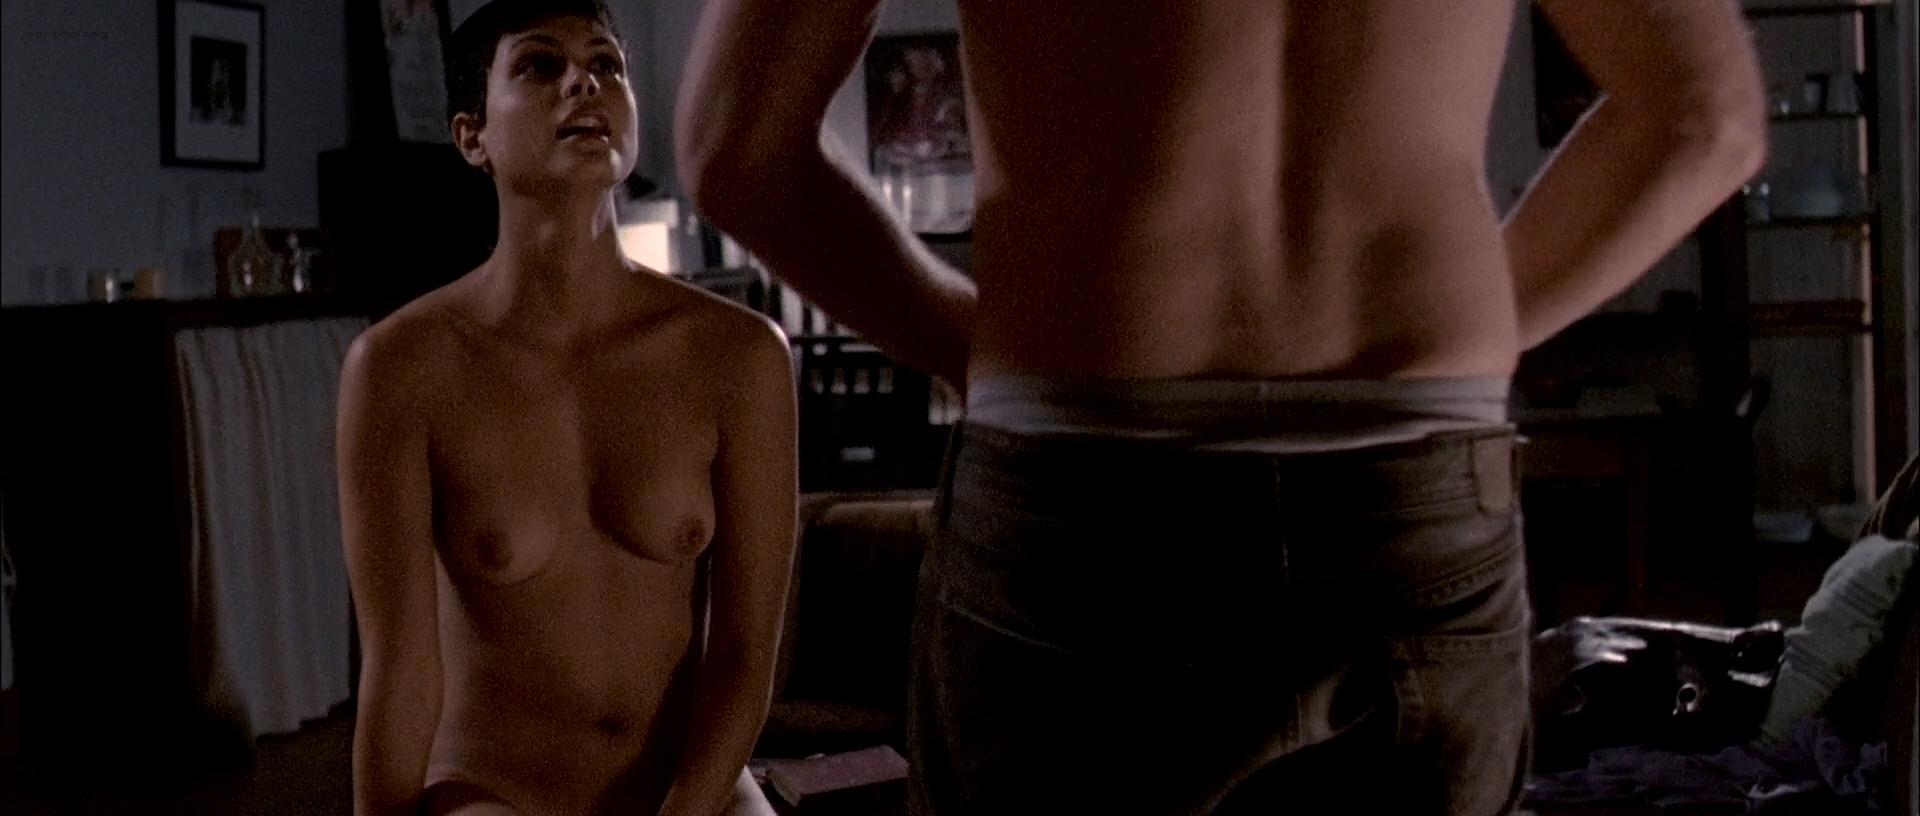 Morena Baccarin nude topless, Vanessa Kai nude sex - Death in Love (2008) hd 1080p Bluray (11)